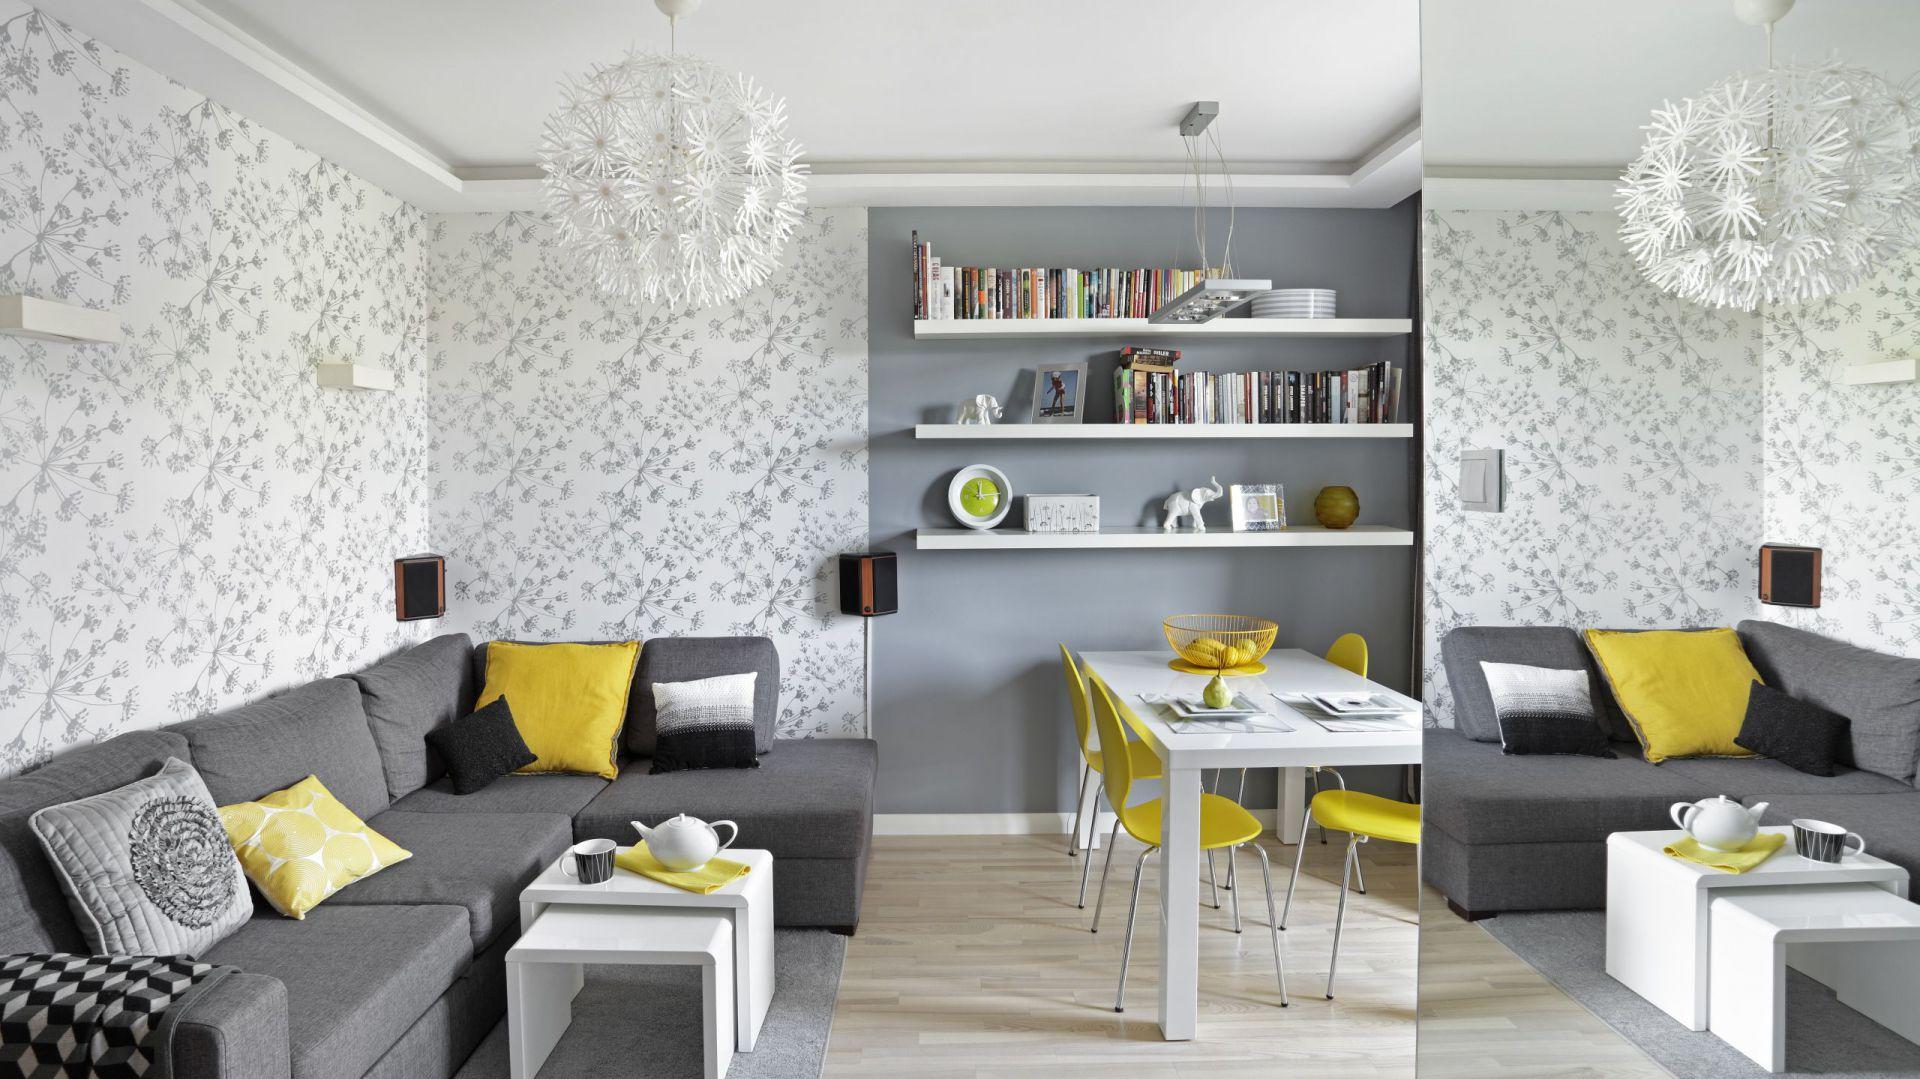 Salon dla rodziny. Projekt: Ewa Para. Fot. Bernard Białorucki